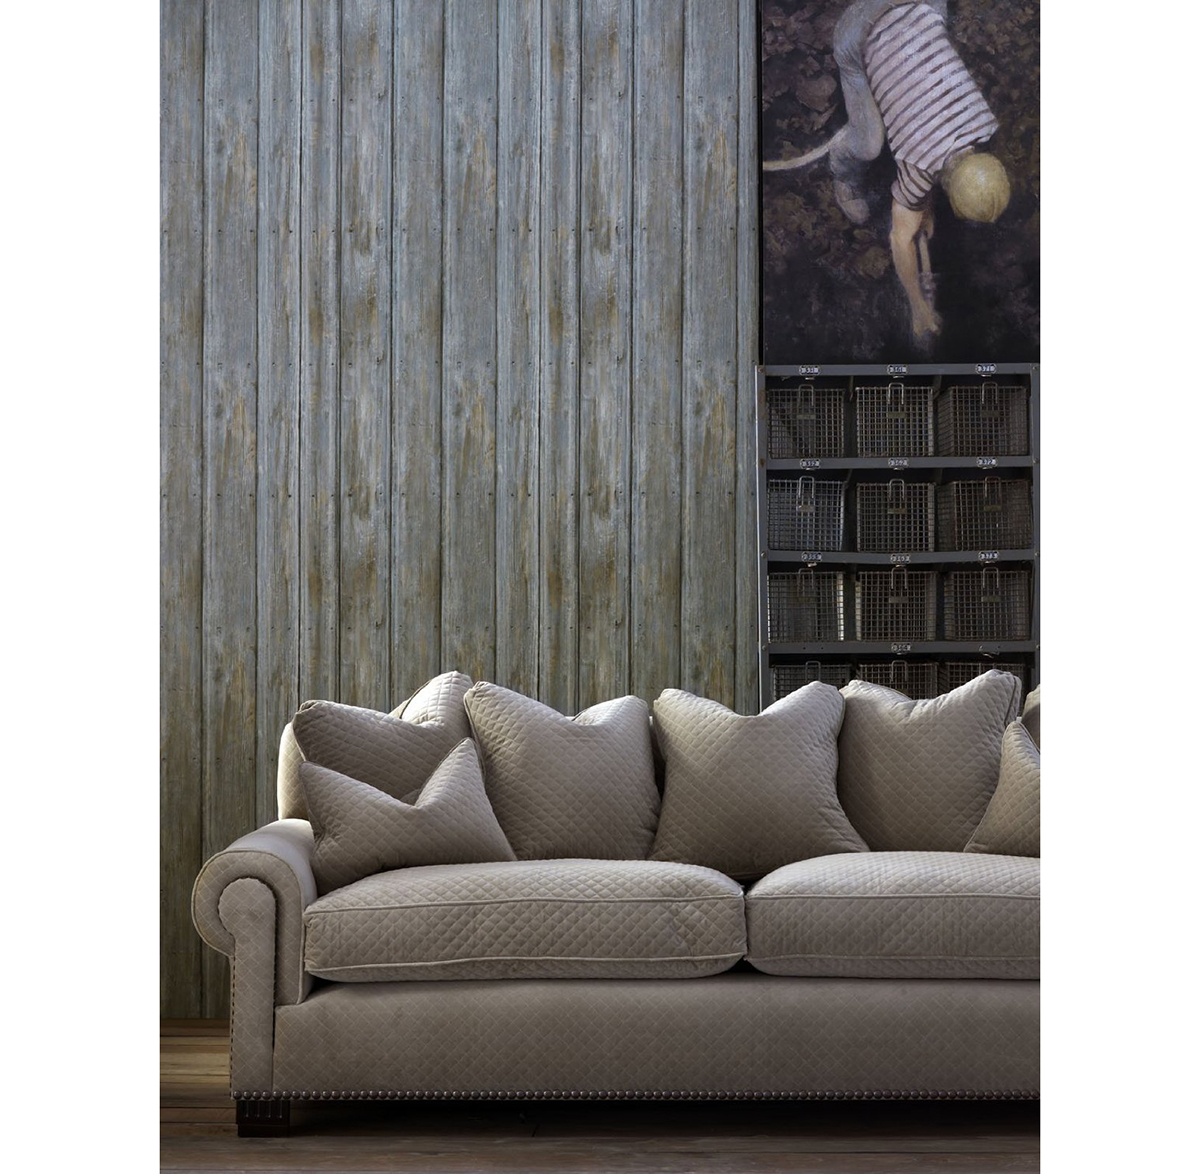 Rustic Lodge Timber Panel Wallpaper - Driftwood